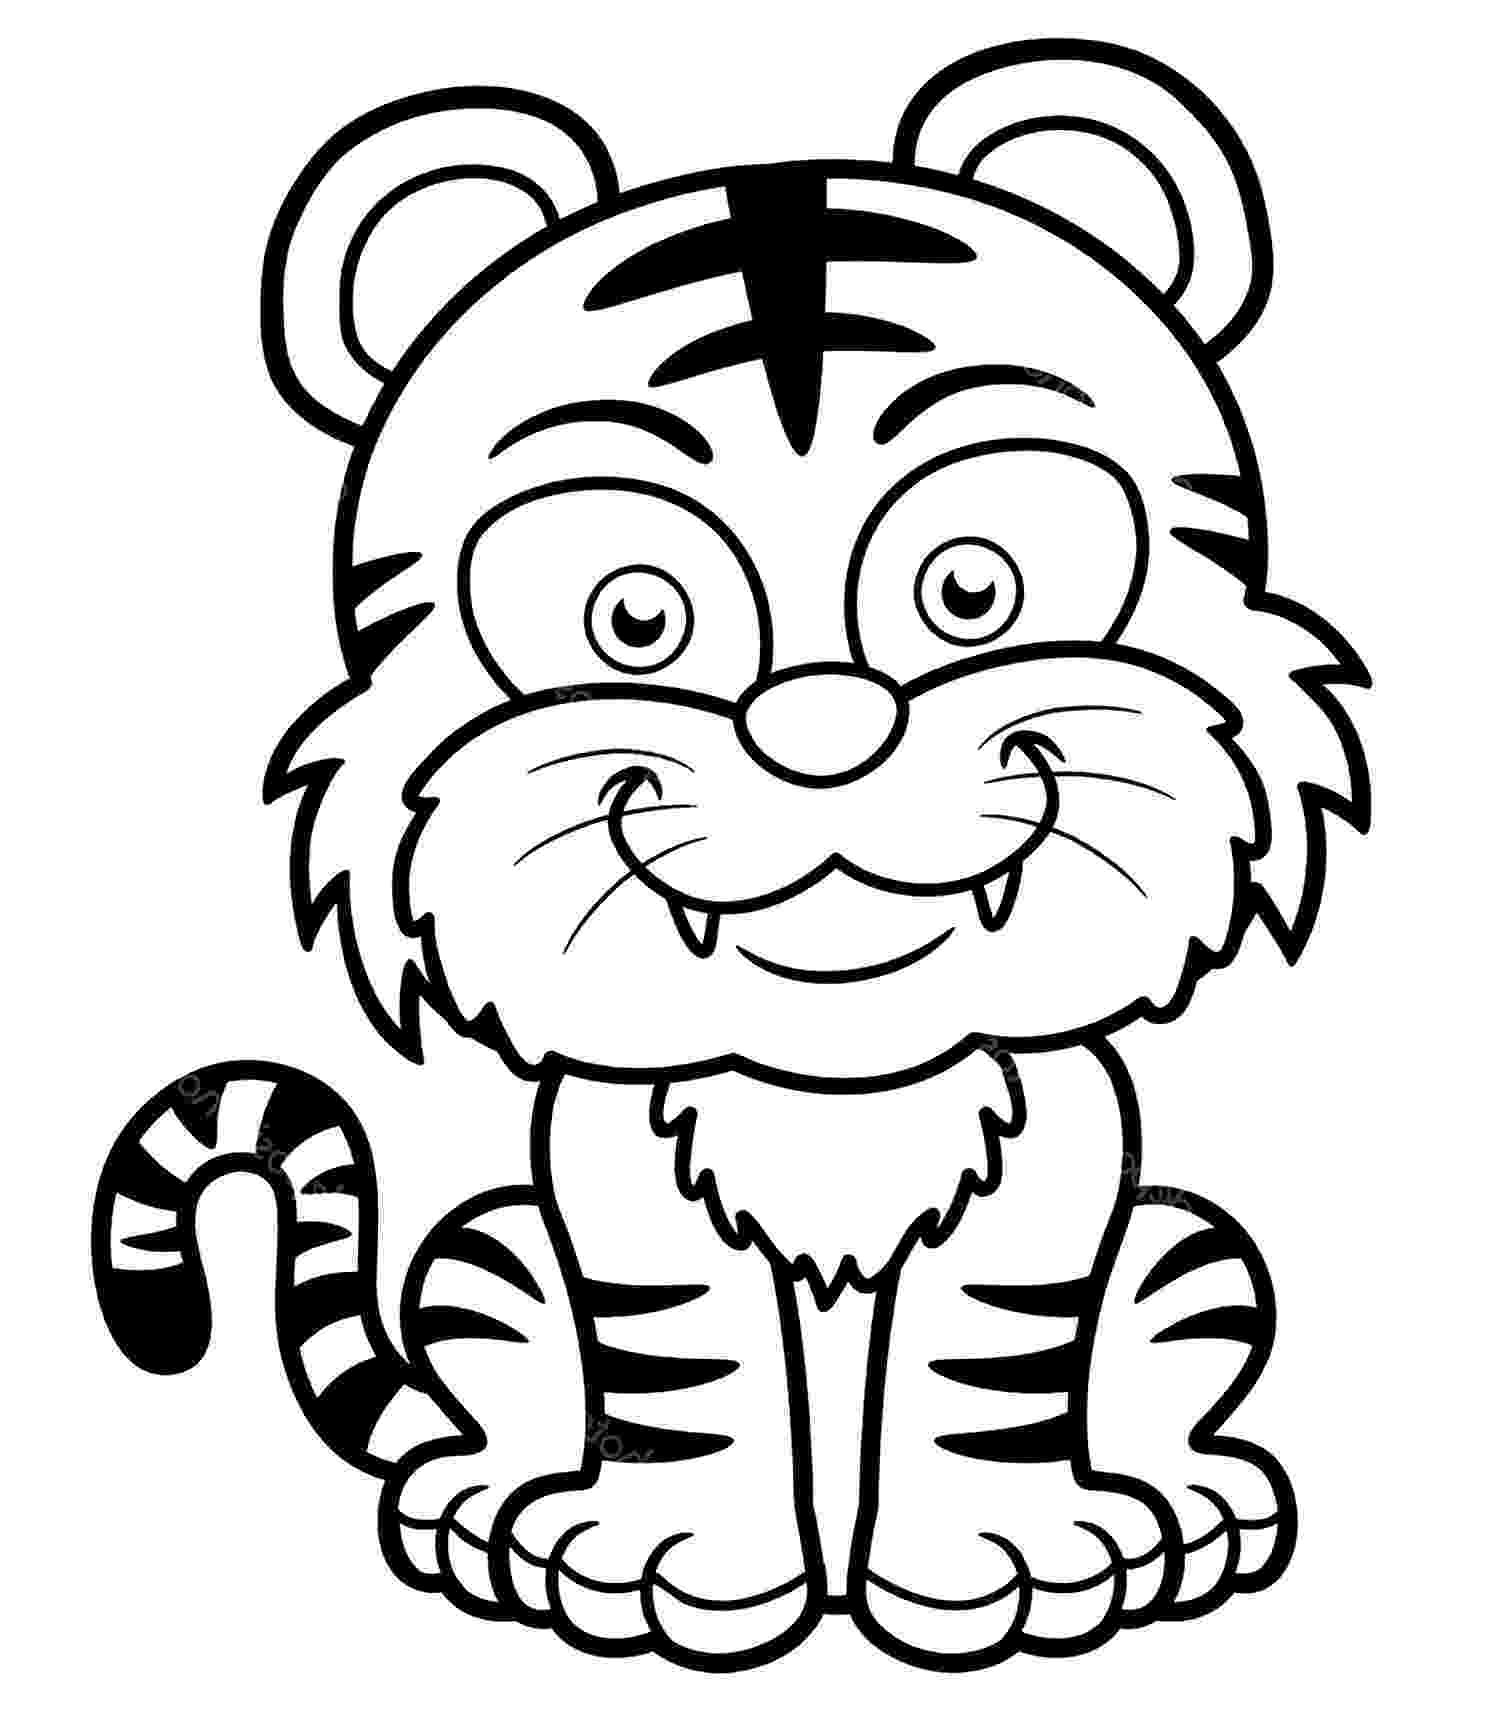 tiger printable tiger coloring page free printable coloring pages printable tiger